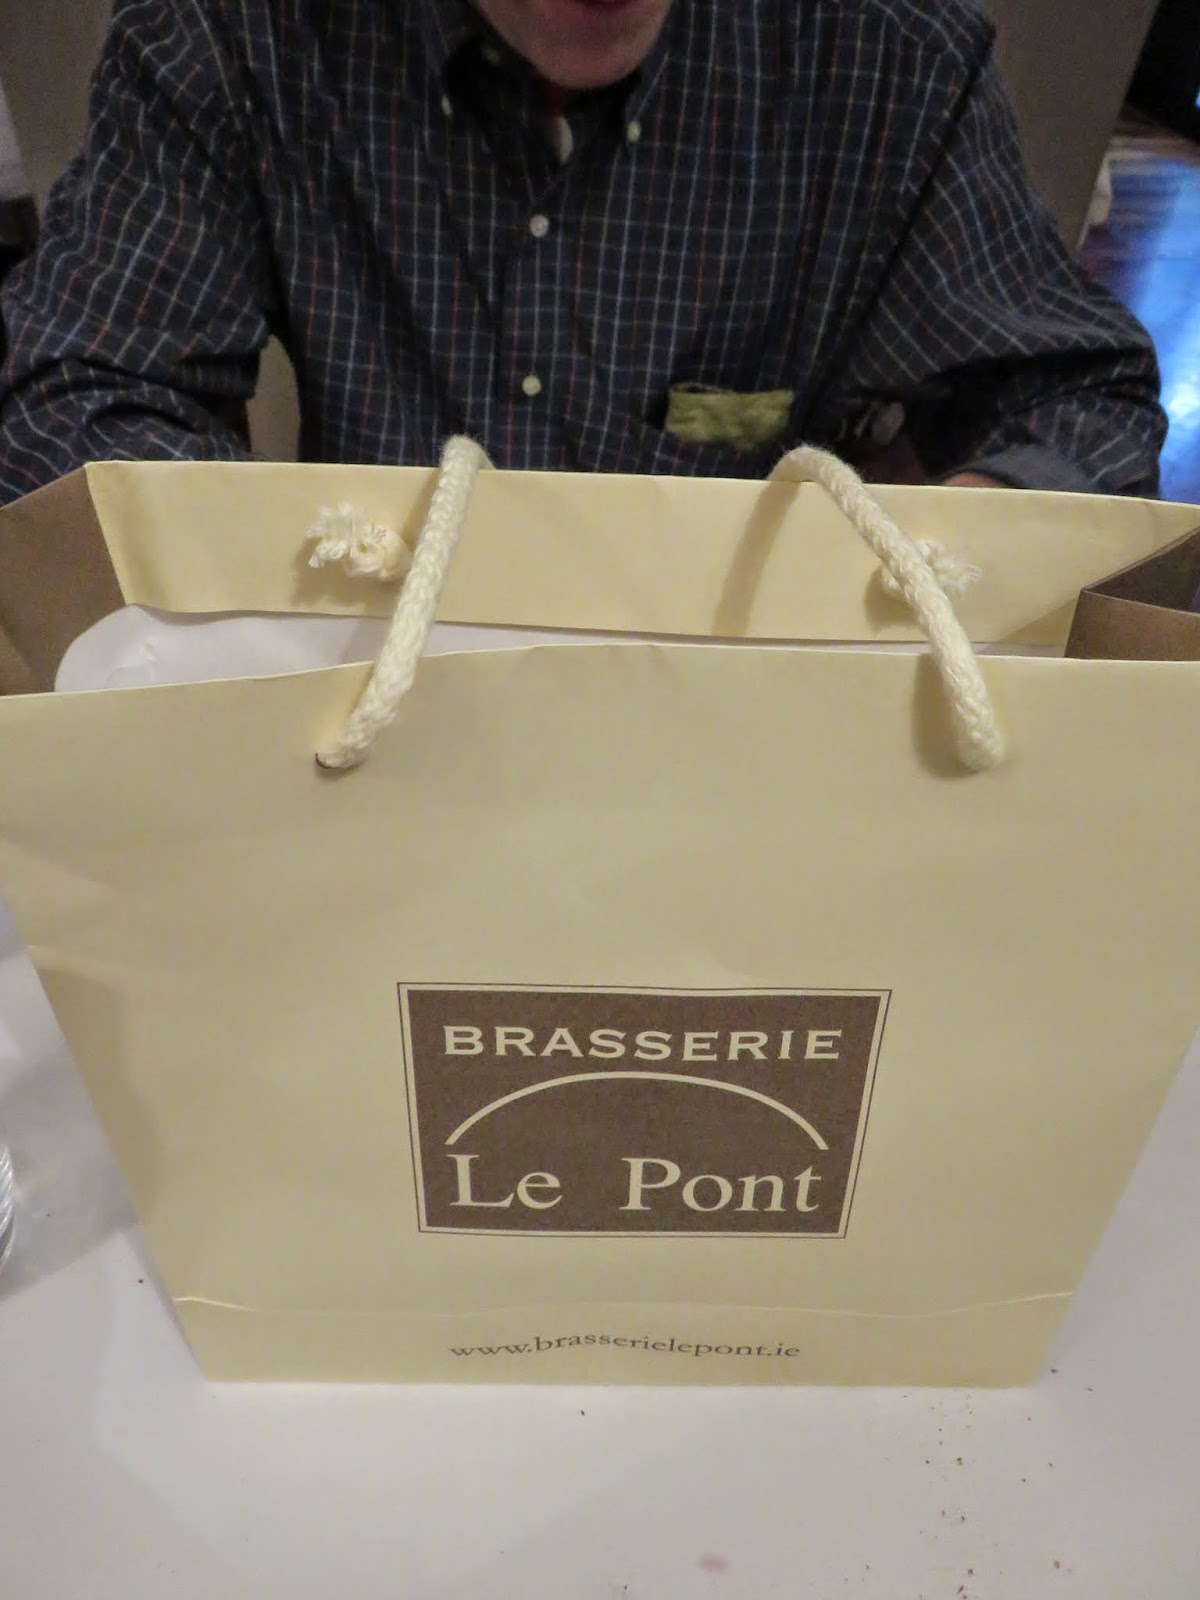 Brasserie Le Pont gift bag